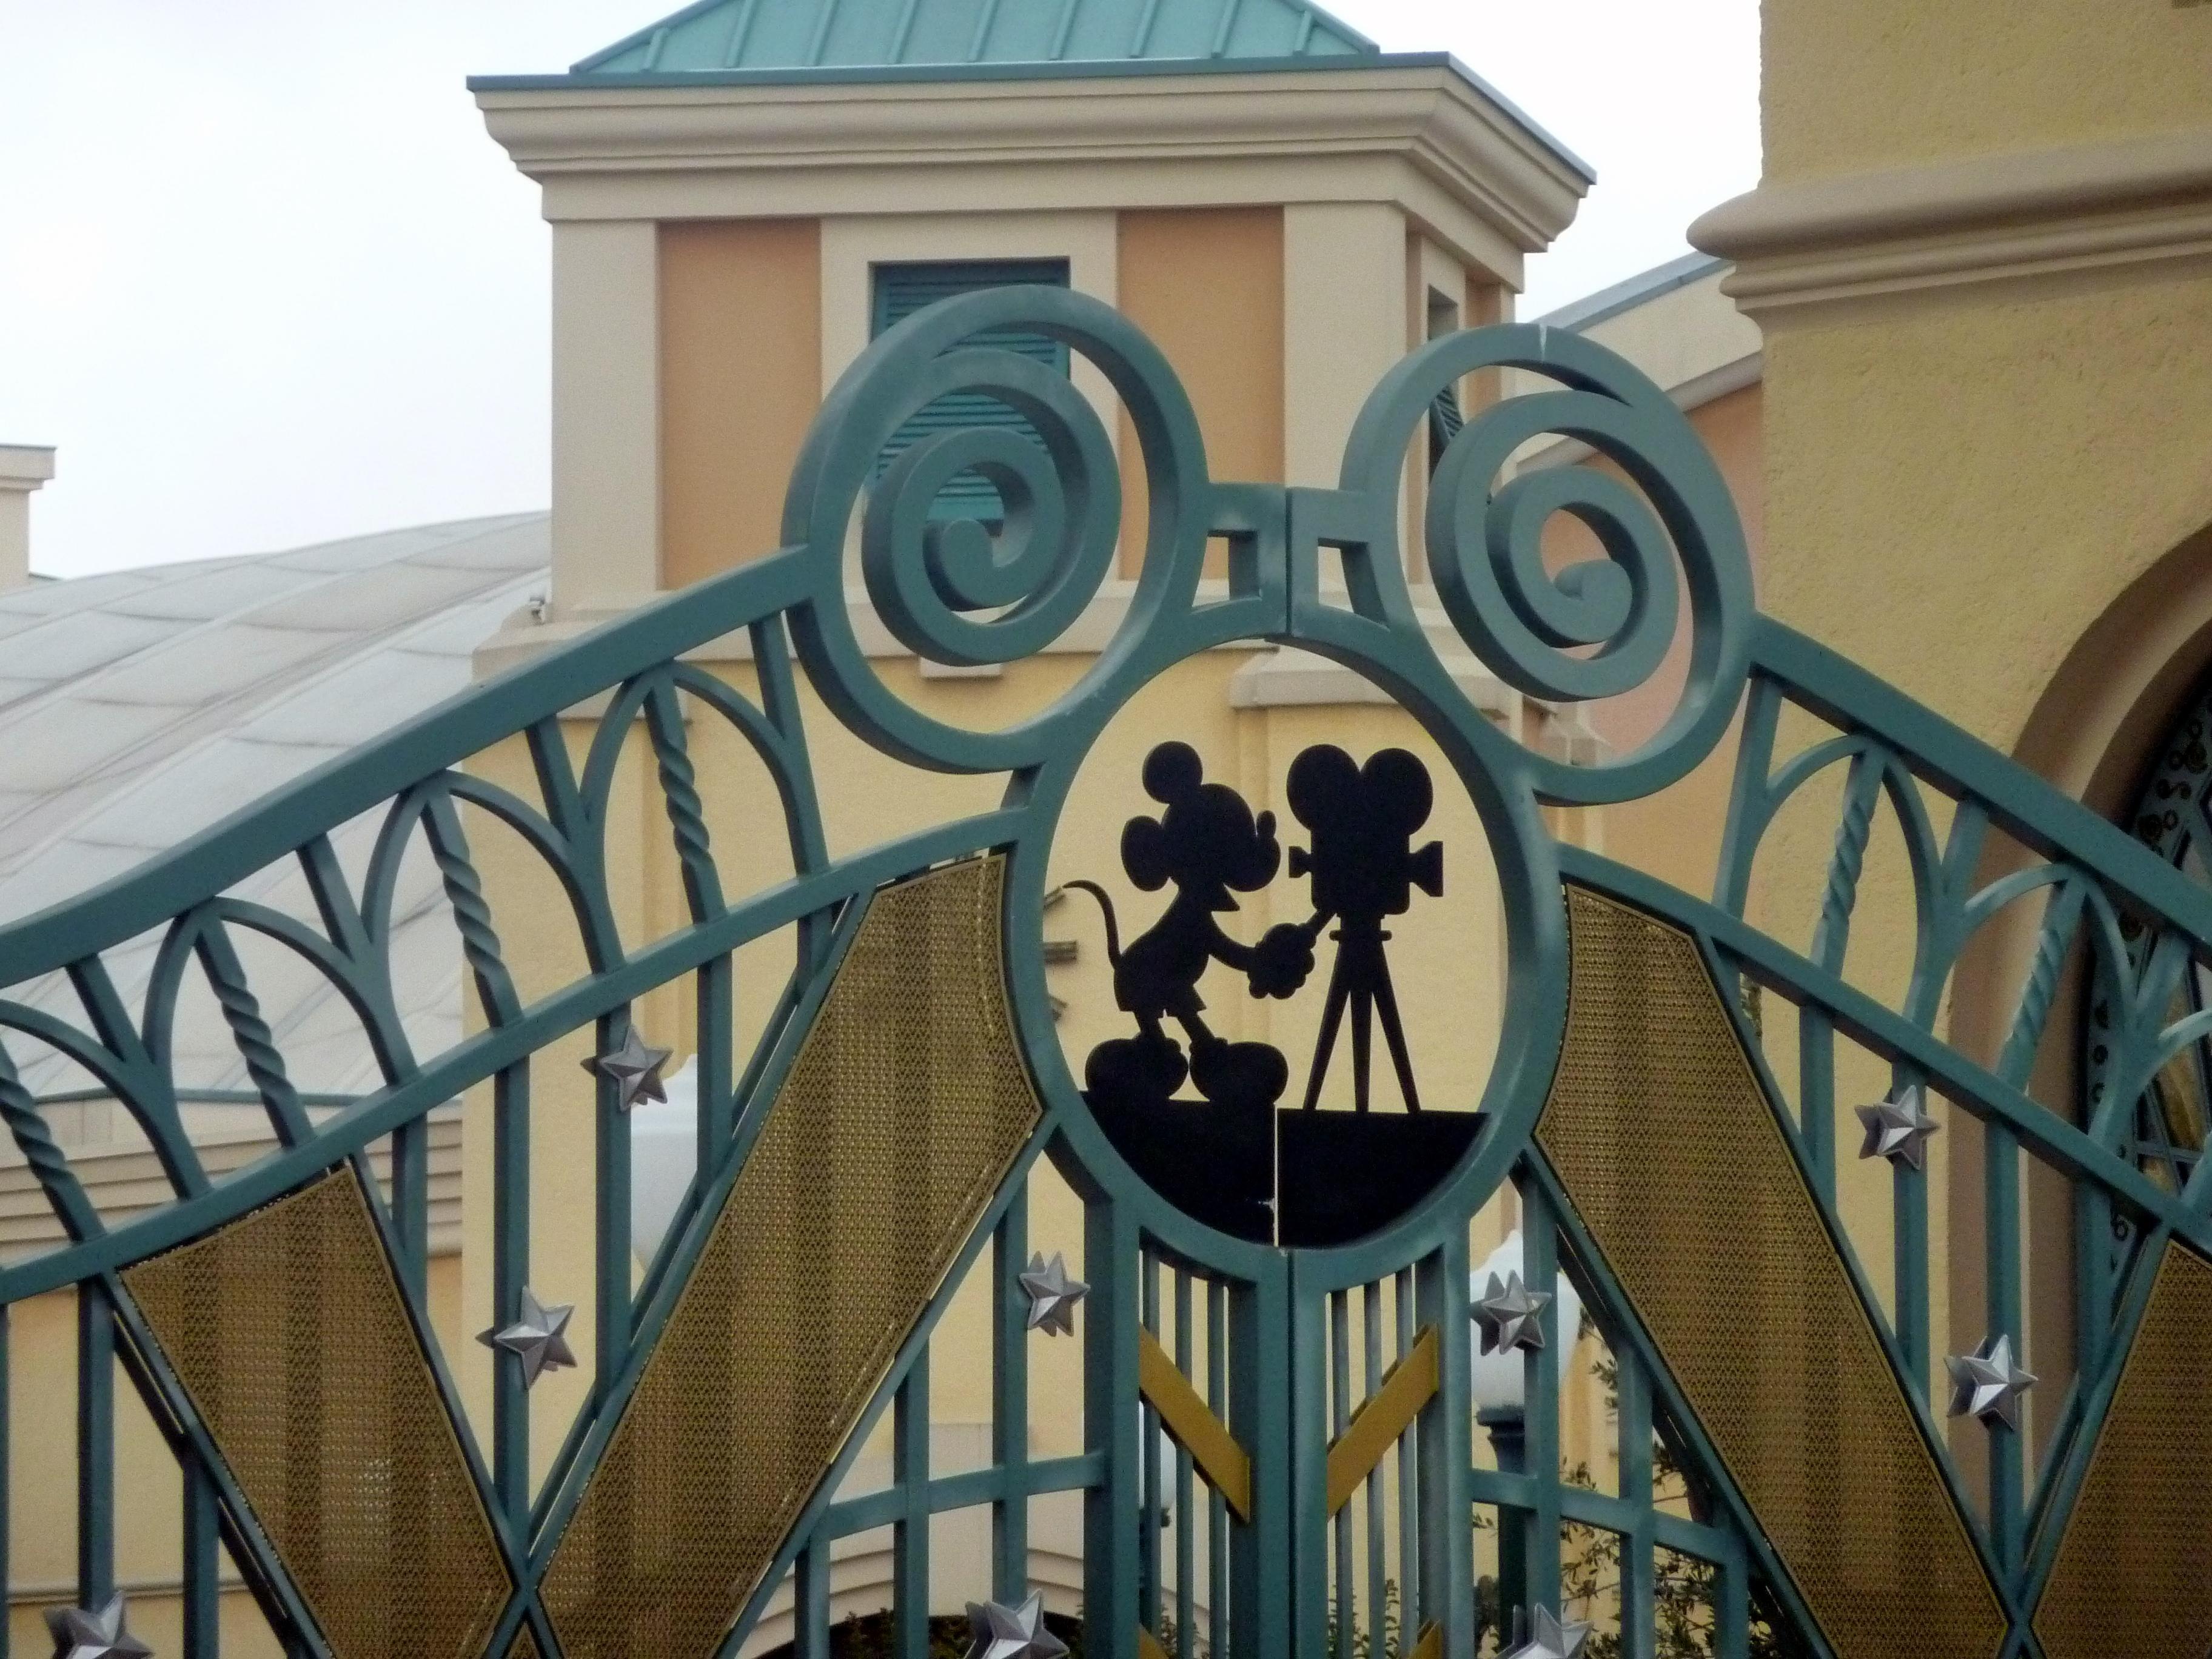 Disney emportera bien sur sa plateforme de streaming Star Wars et Marvel